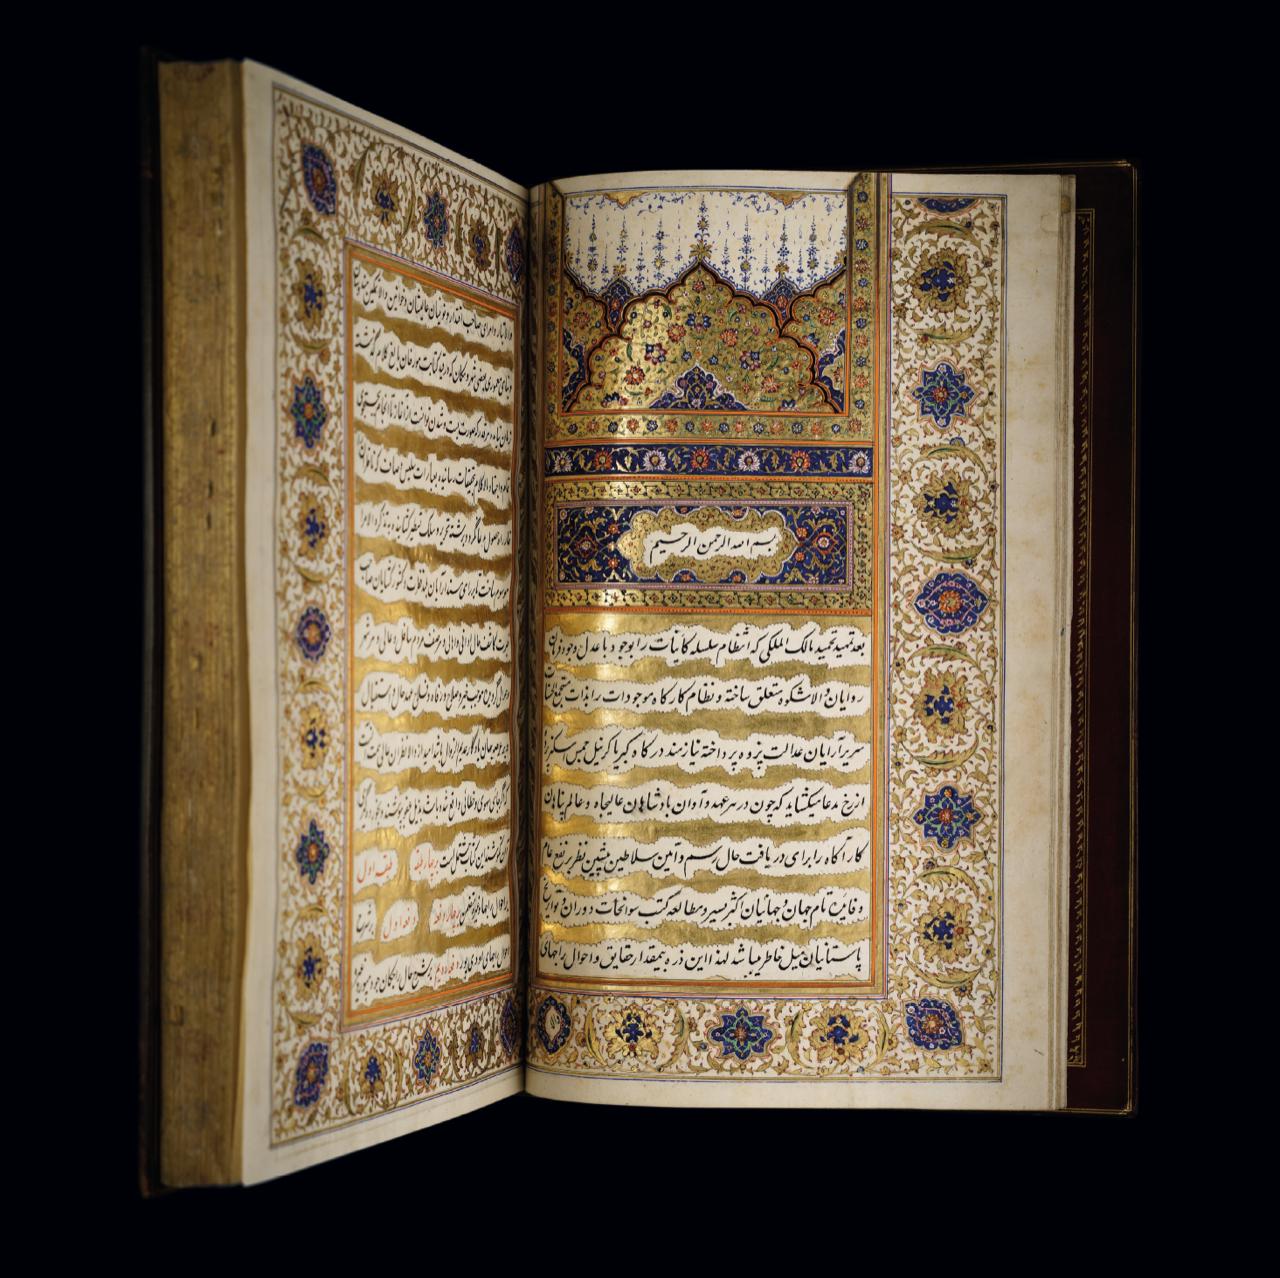 Colonel James Skinner's Tazkirat al-umara ('Biographies of the Nobles')